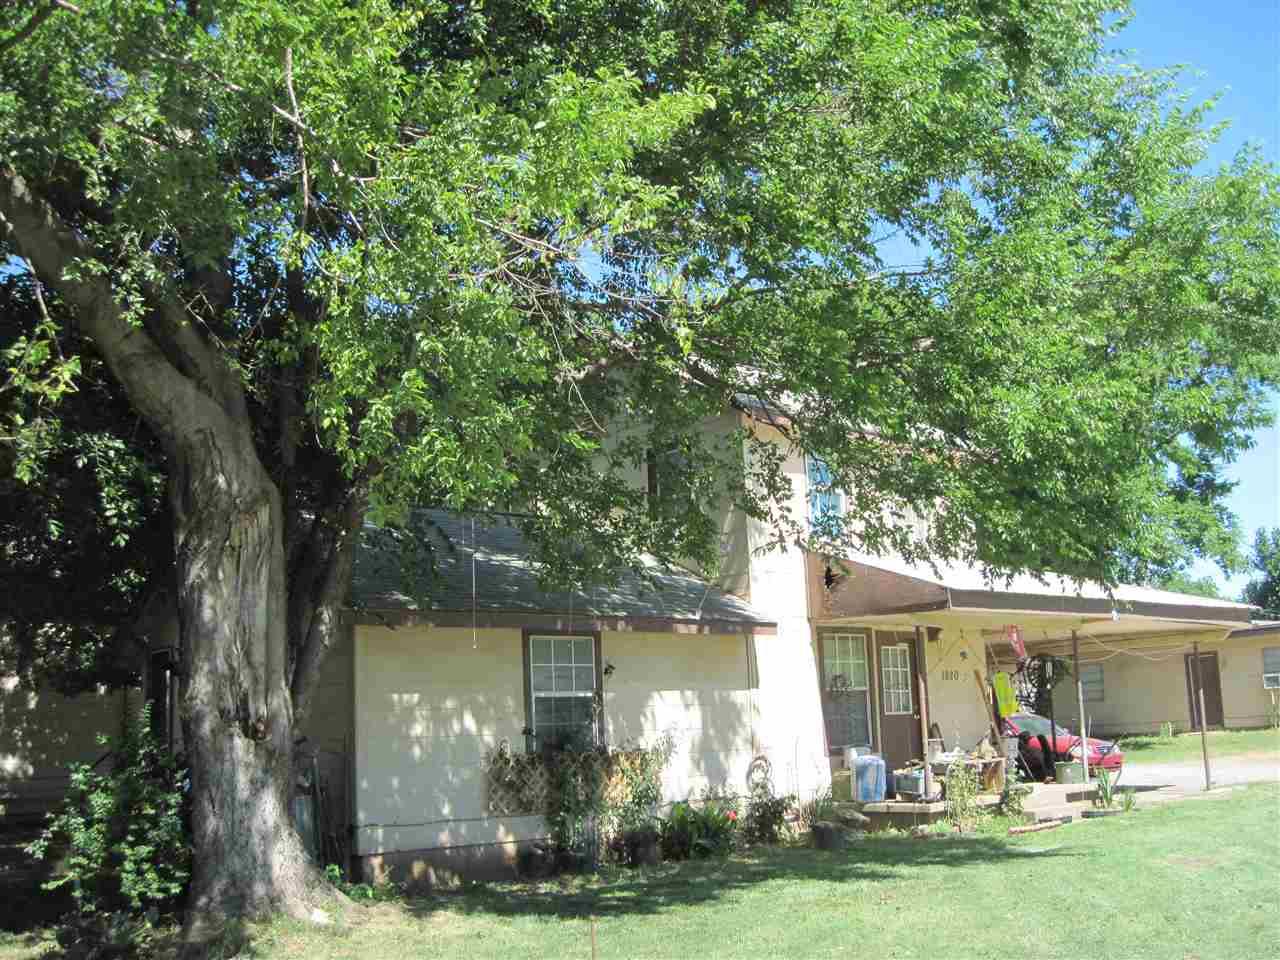 1810-1816 S Perkins Road, Stillwater, OK 74074